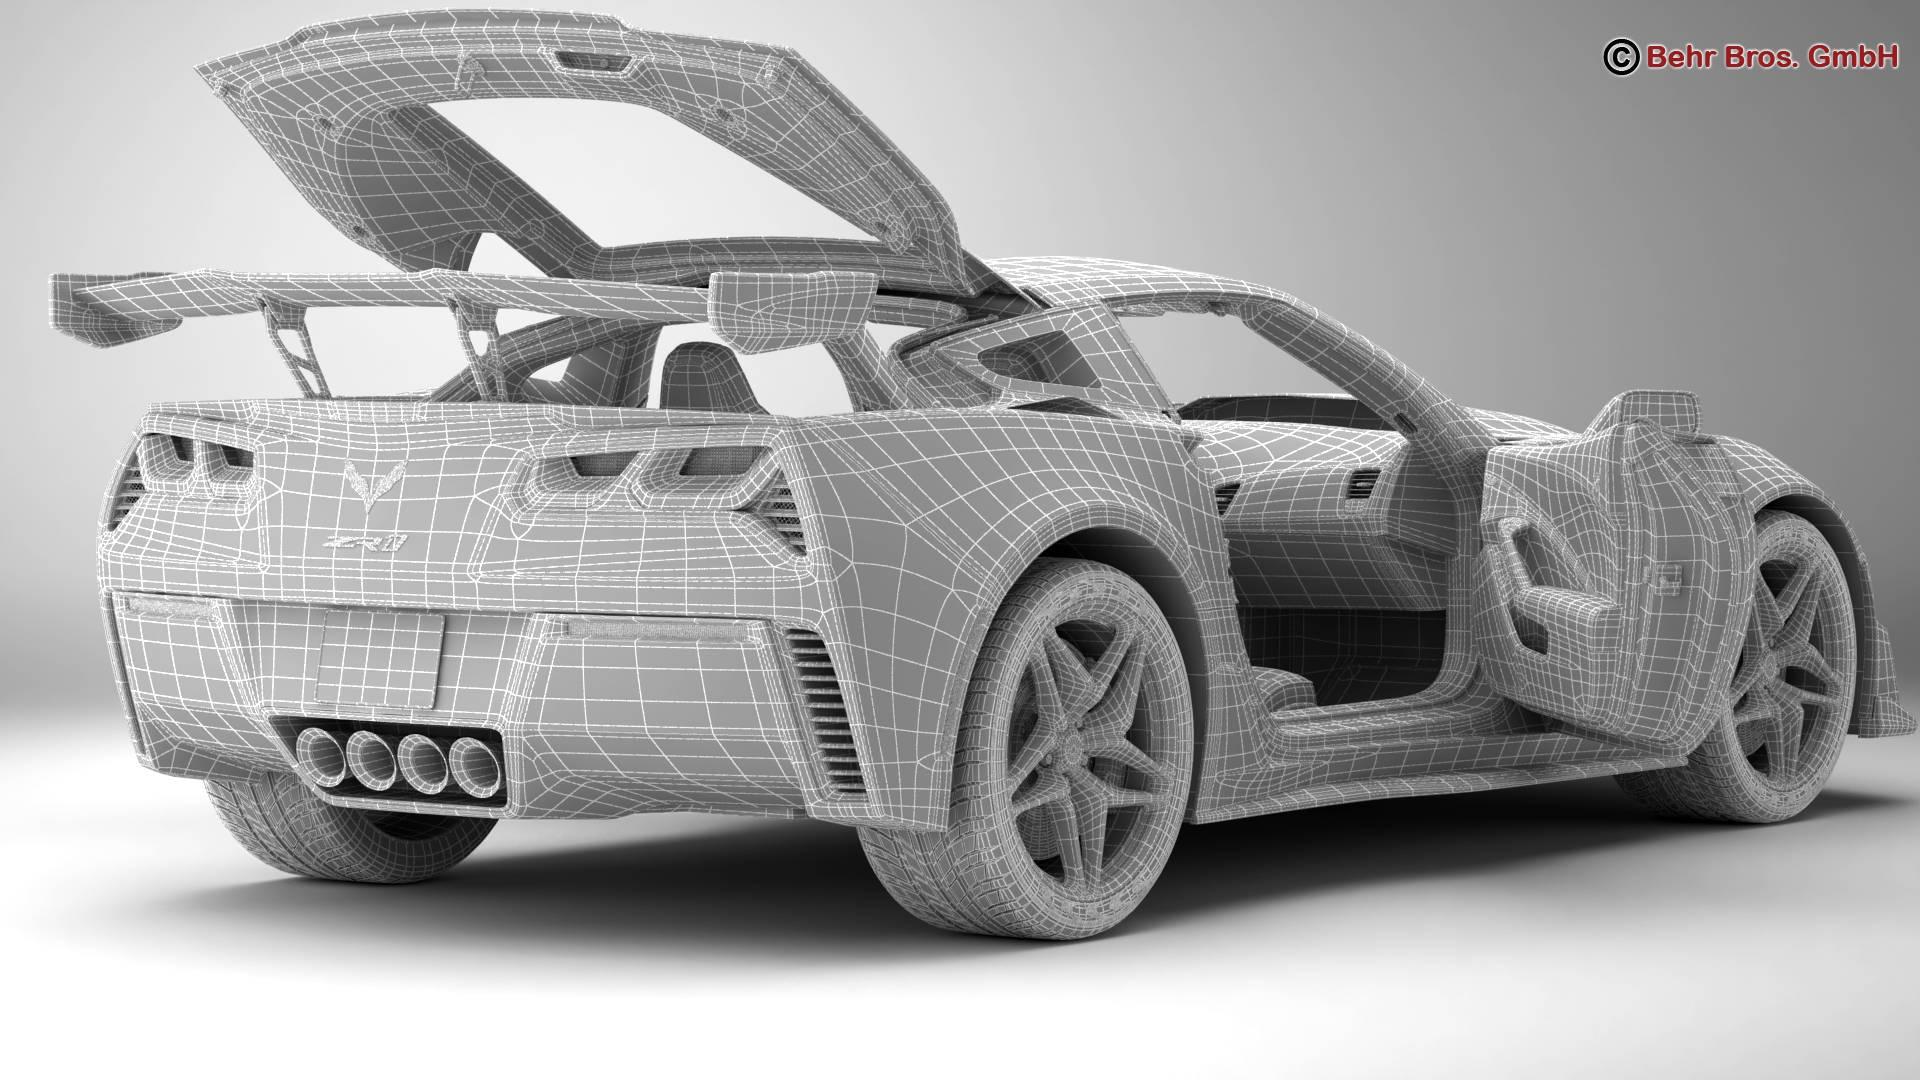 chevrolet corvette zr1 2019 3d model 3ds max fbx c4d lwo ma mb obj 275985